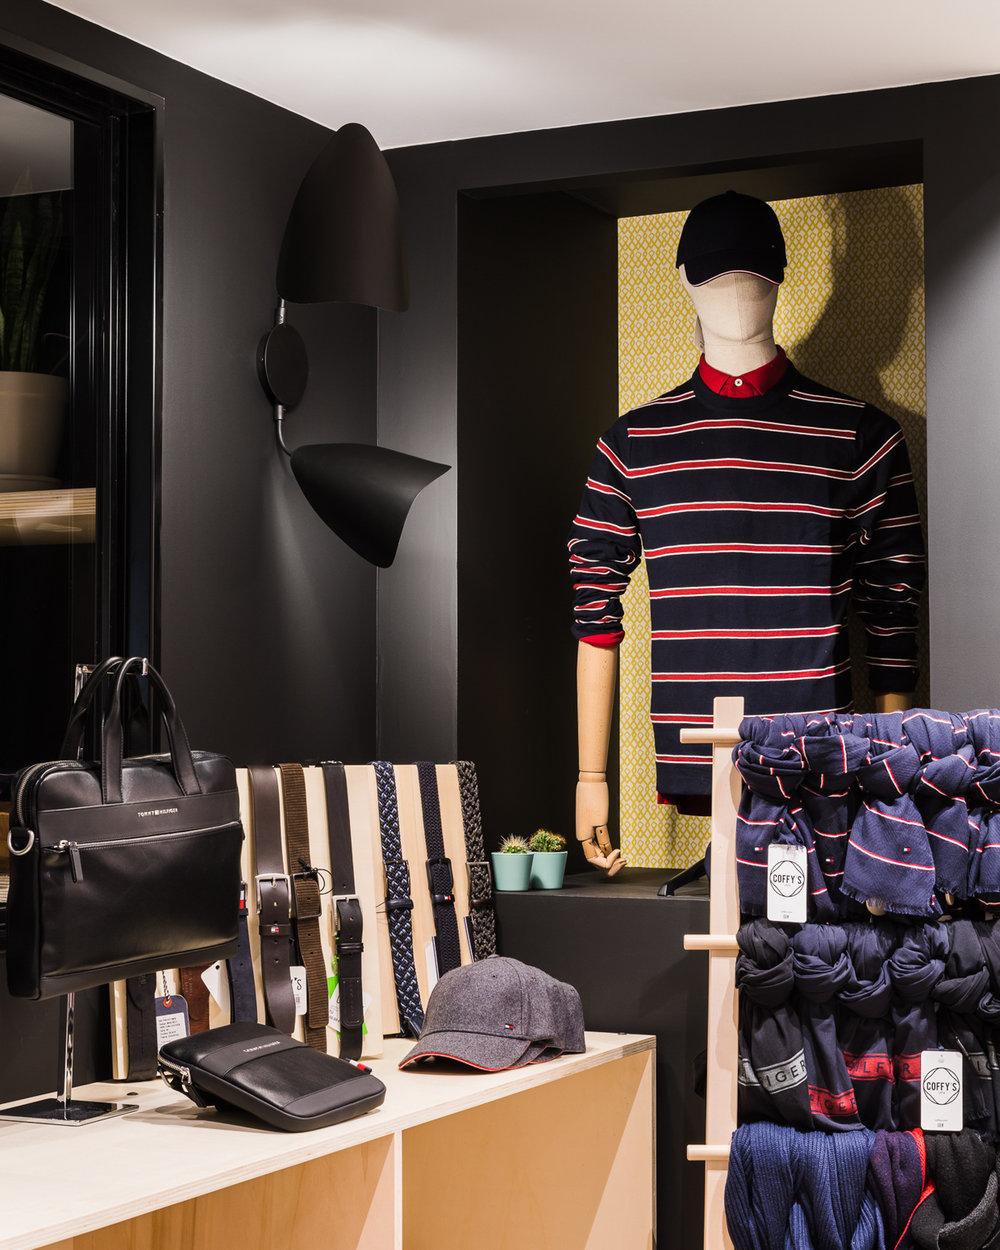 boutique_coffys_photographie_commerce -5.jpg